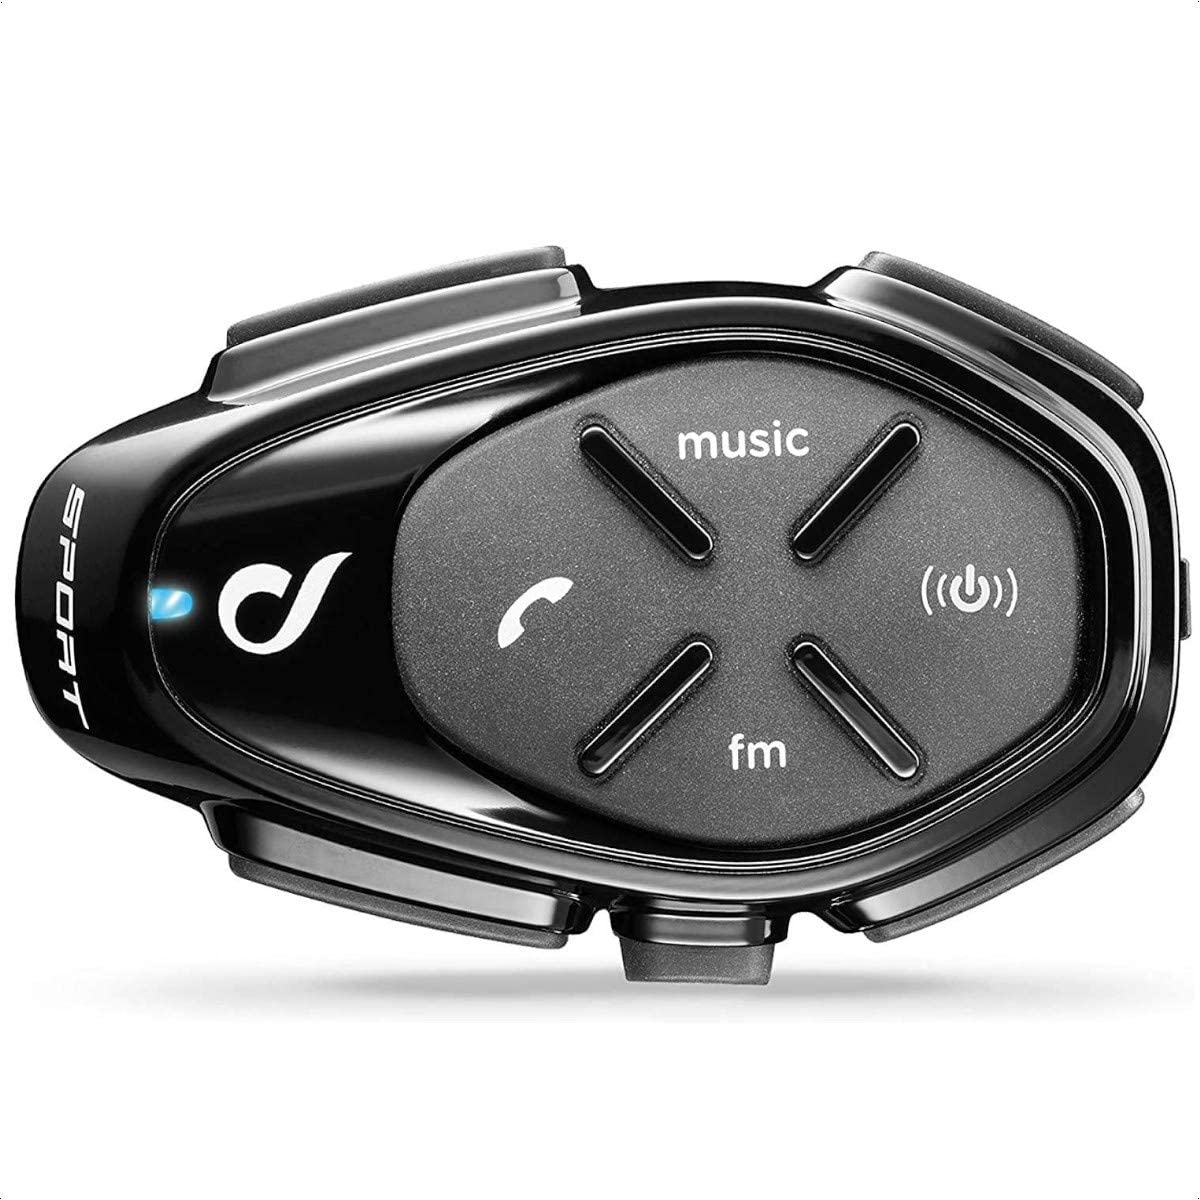 INTERPHONE INTERPHOSPORT Interfono da Moto con Bluetooth